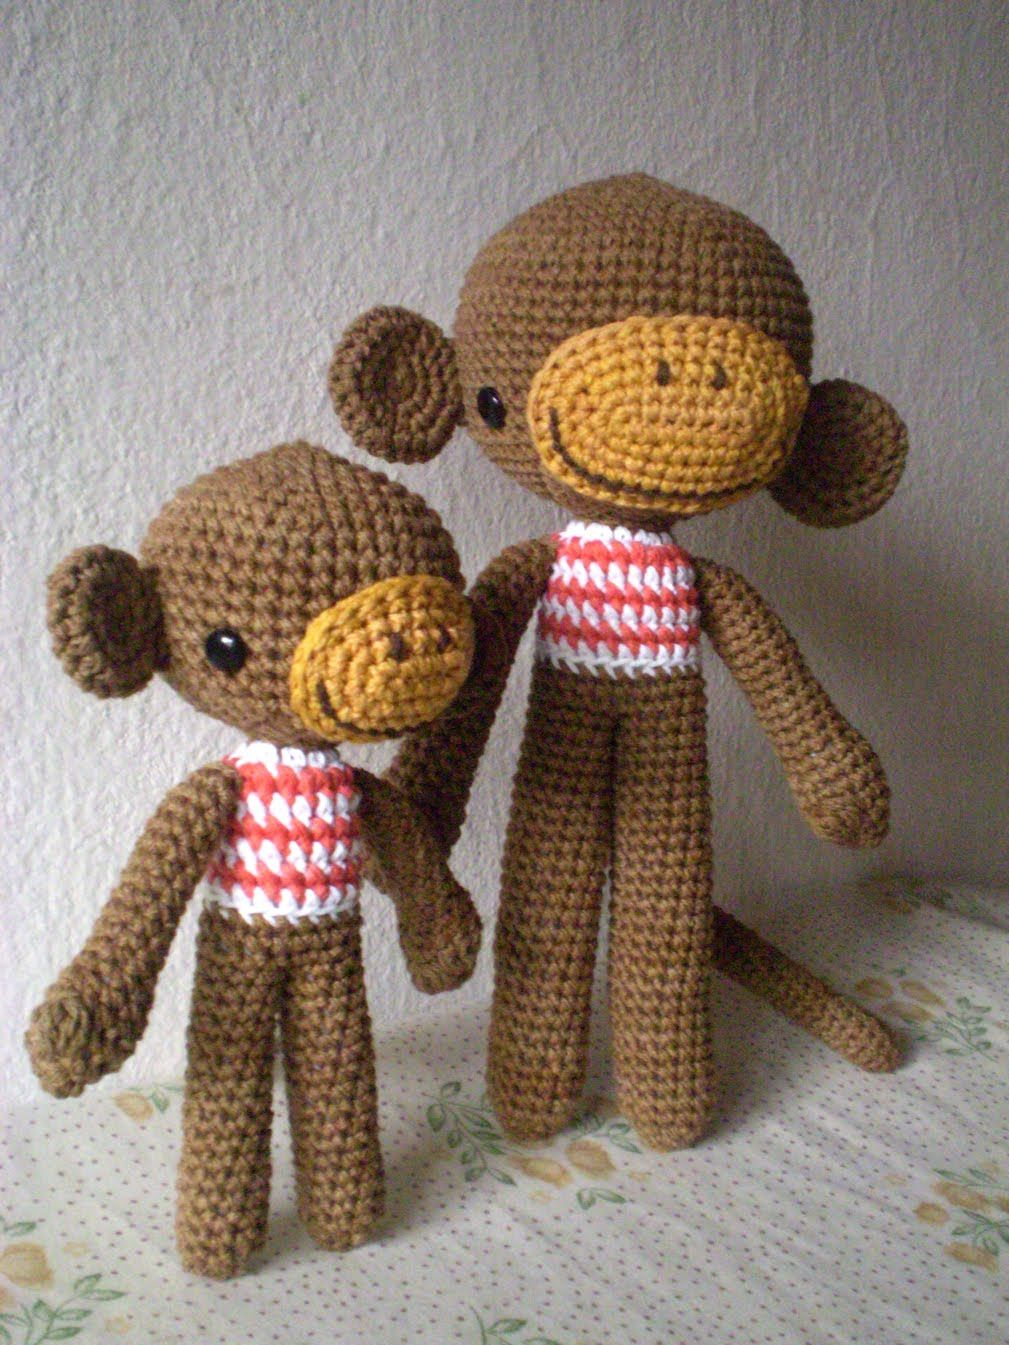 pica-pau: patrón de mono (monkey crochet pattern) | Crochet Español ...